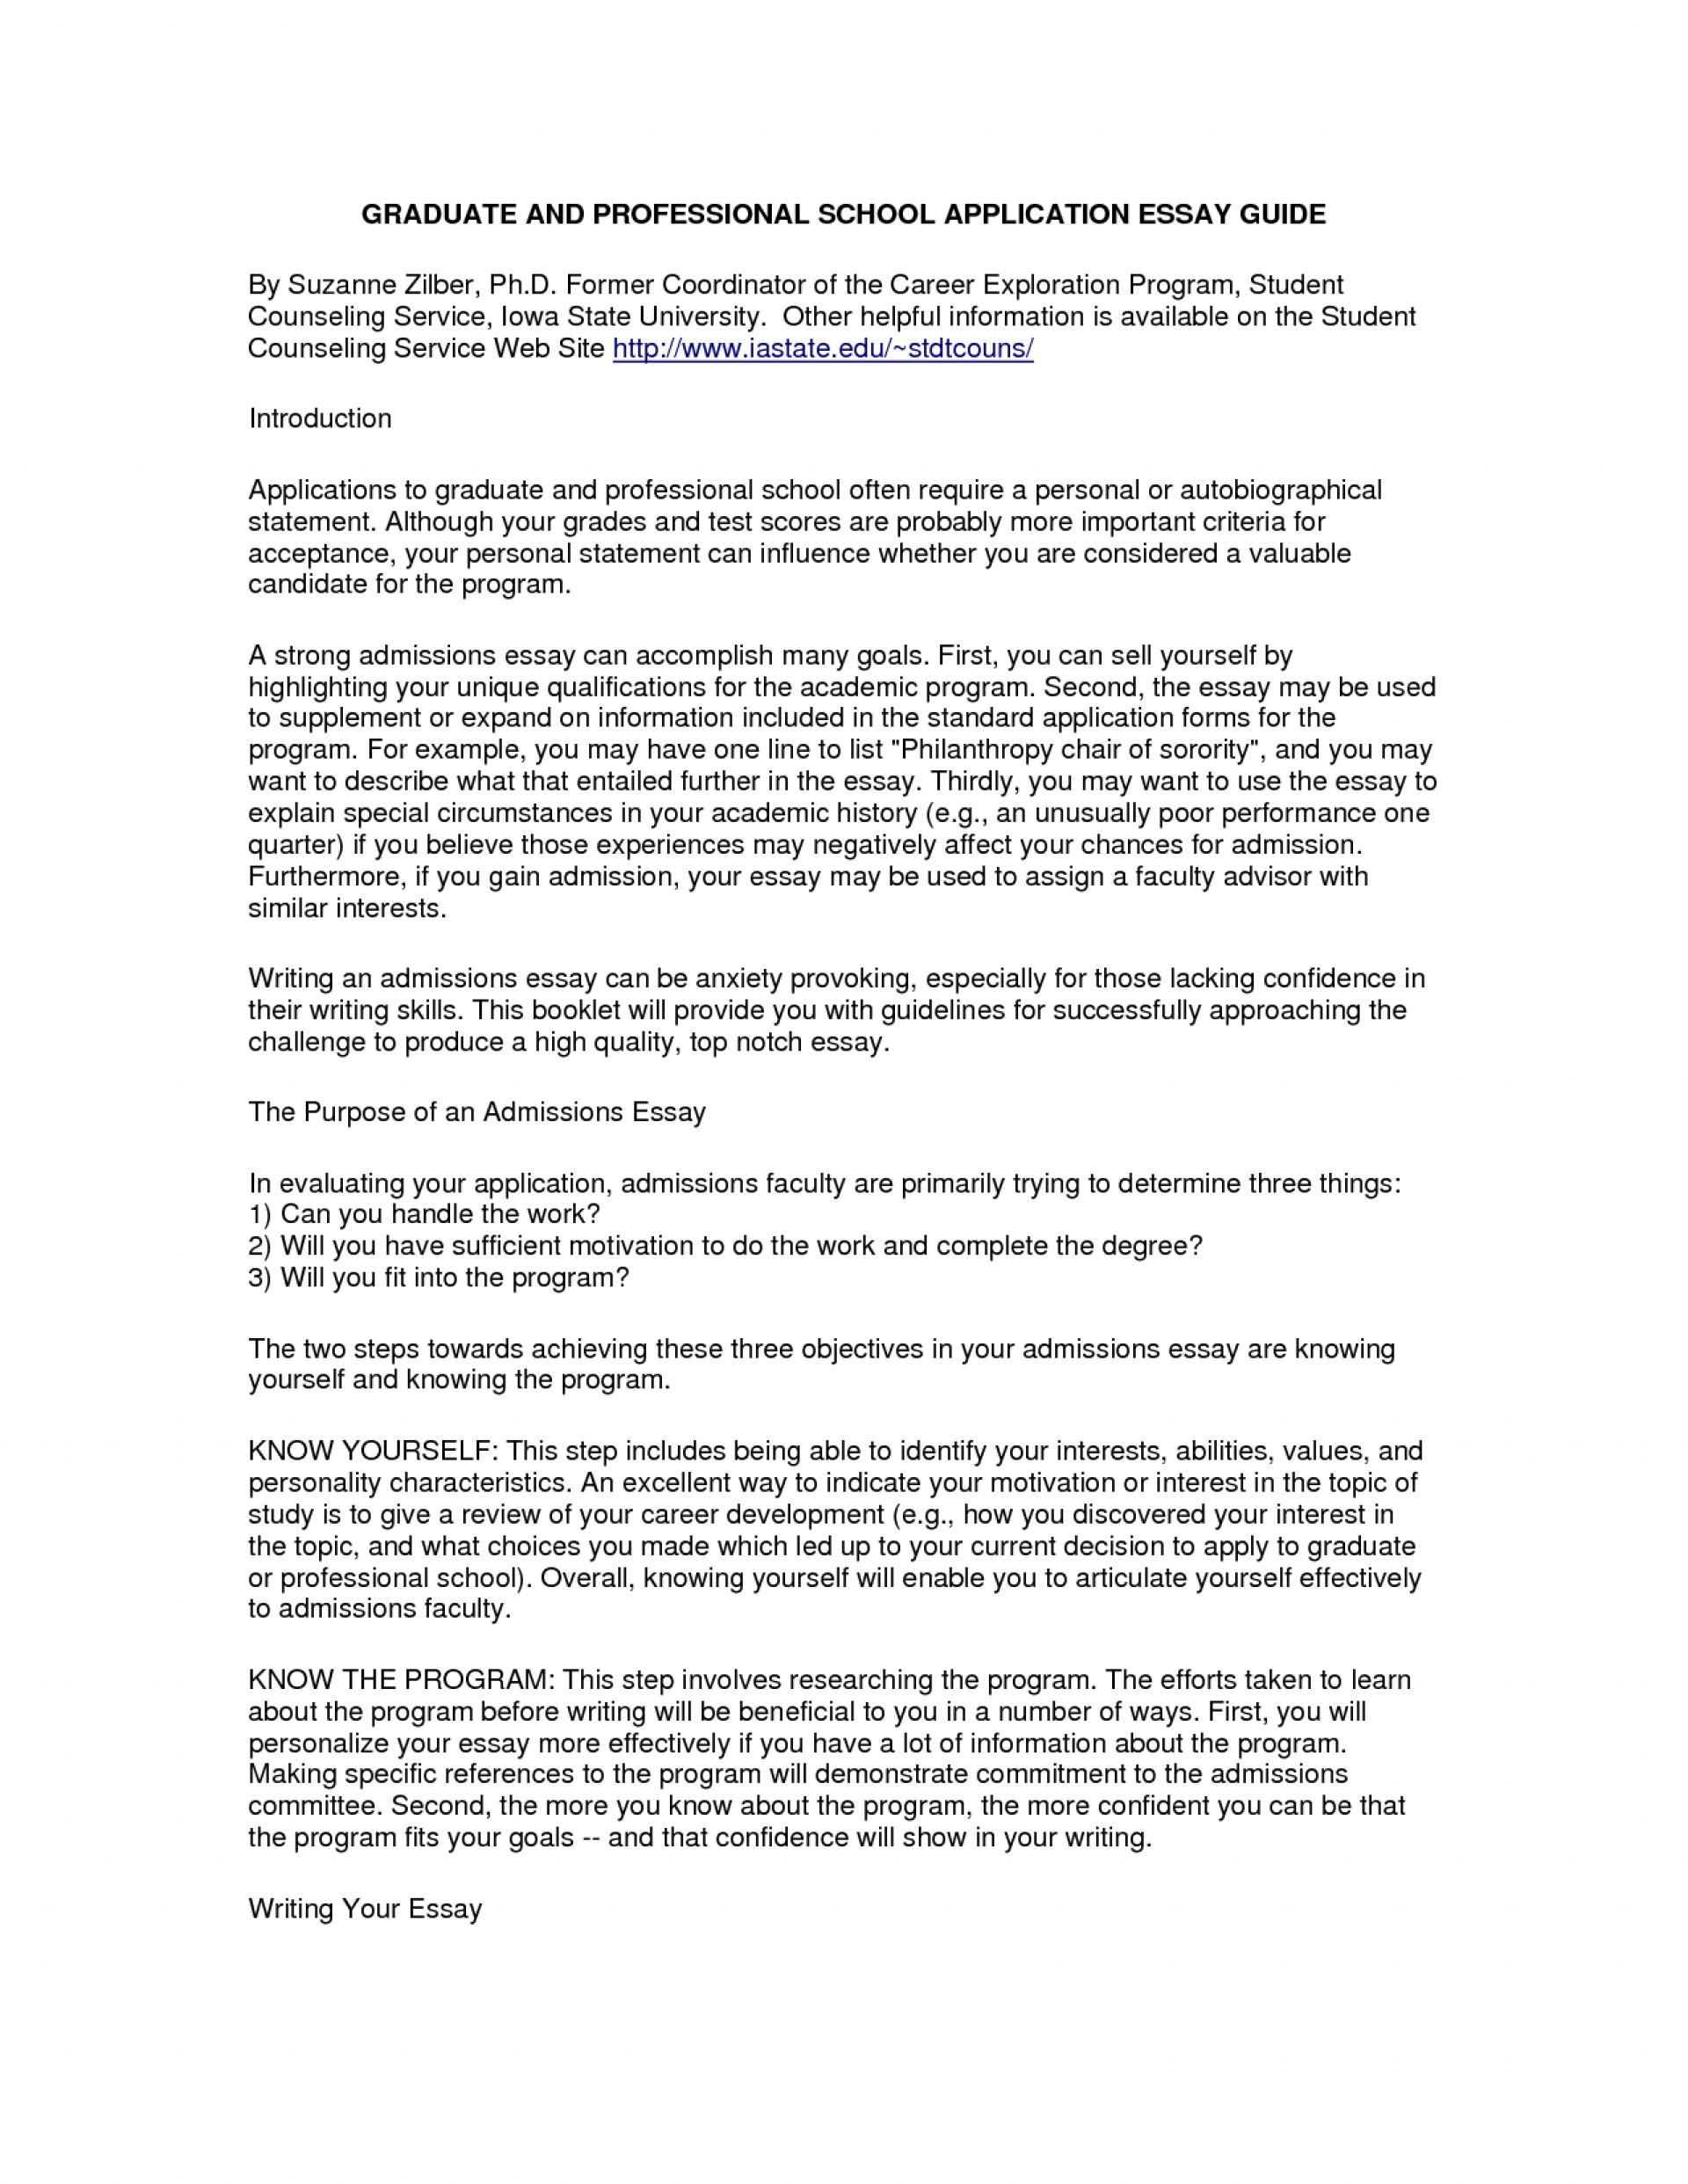 012 Essay Example Nursing School Impressive Sample Prompts 1920